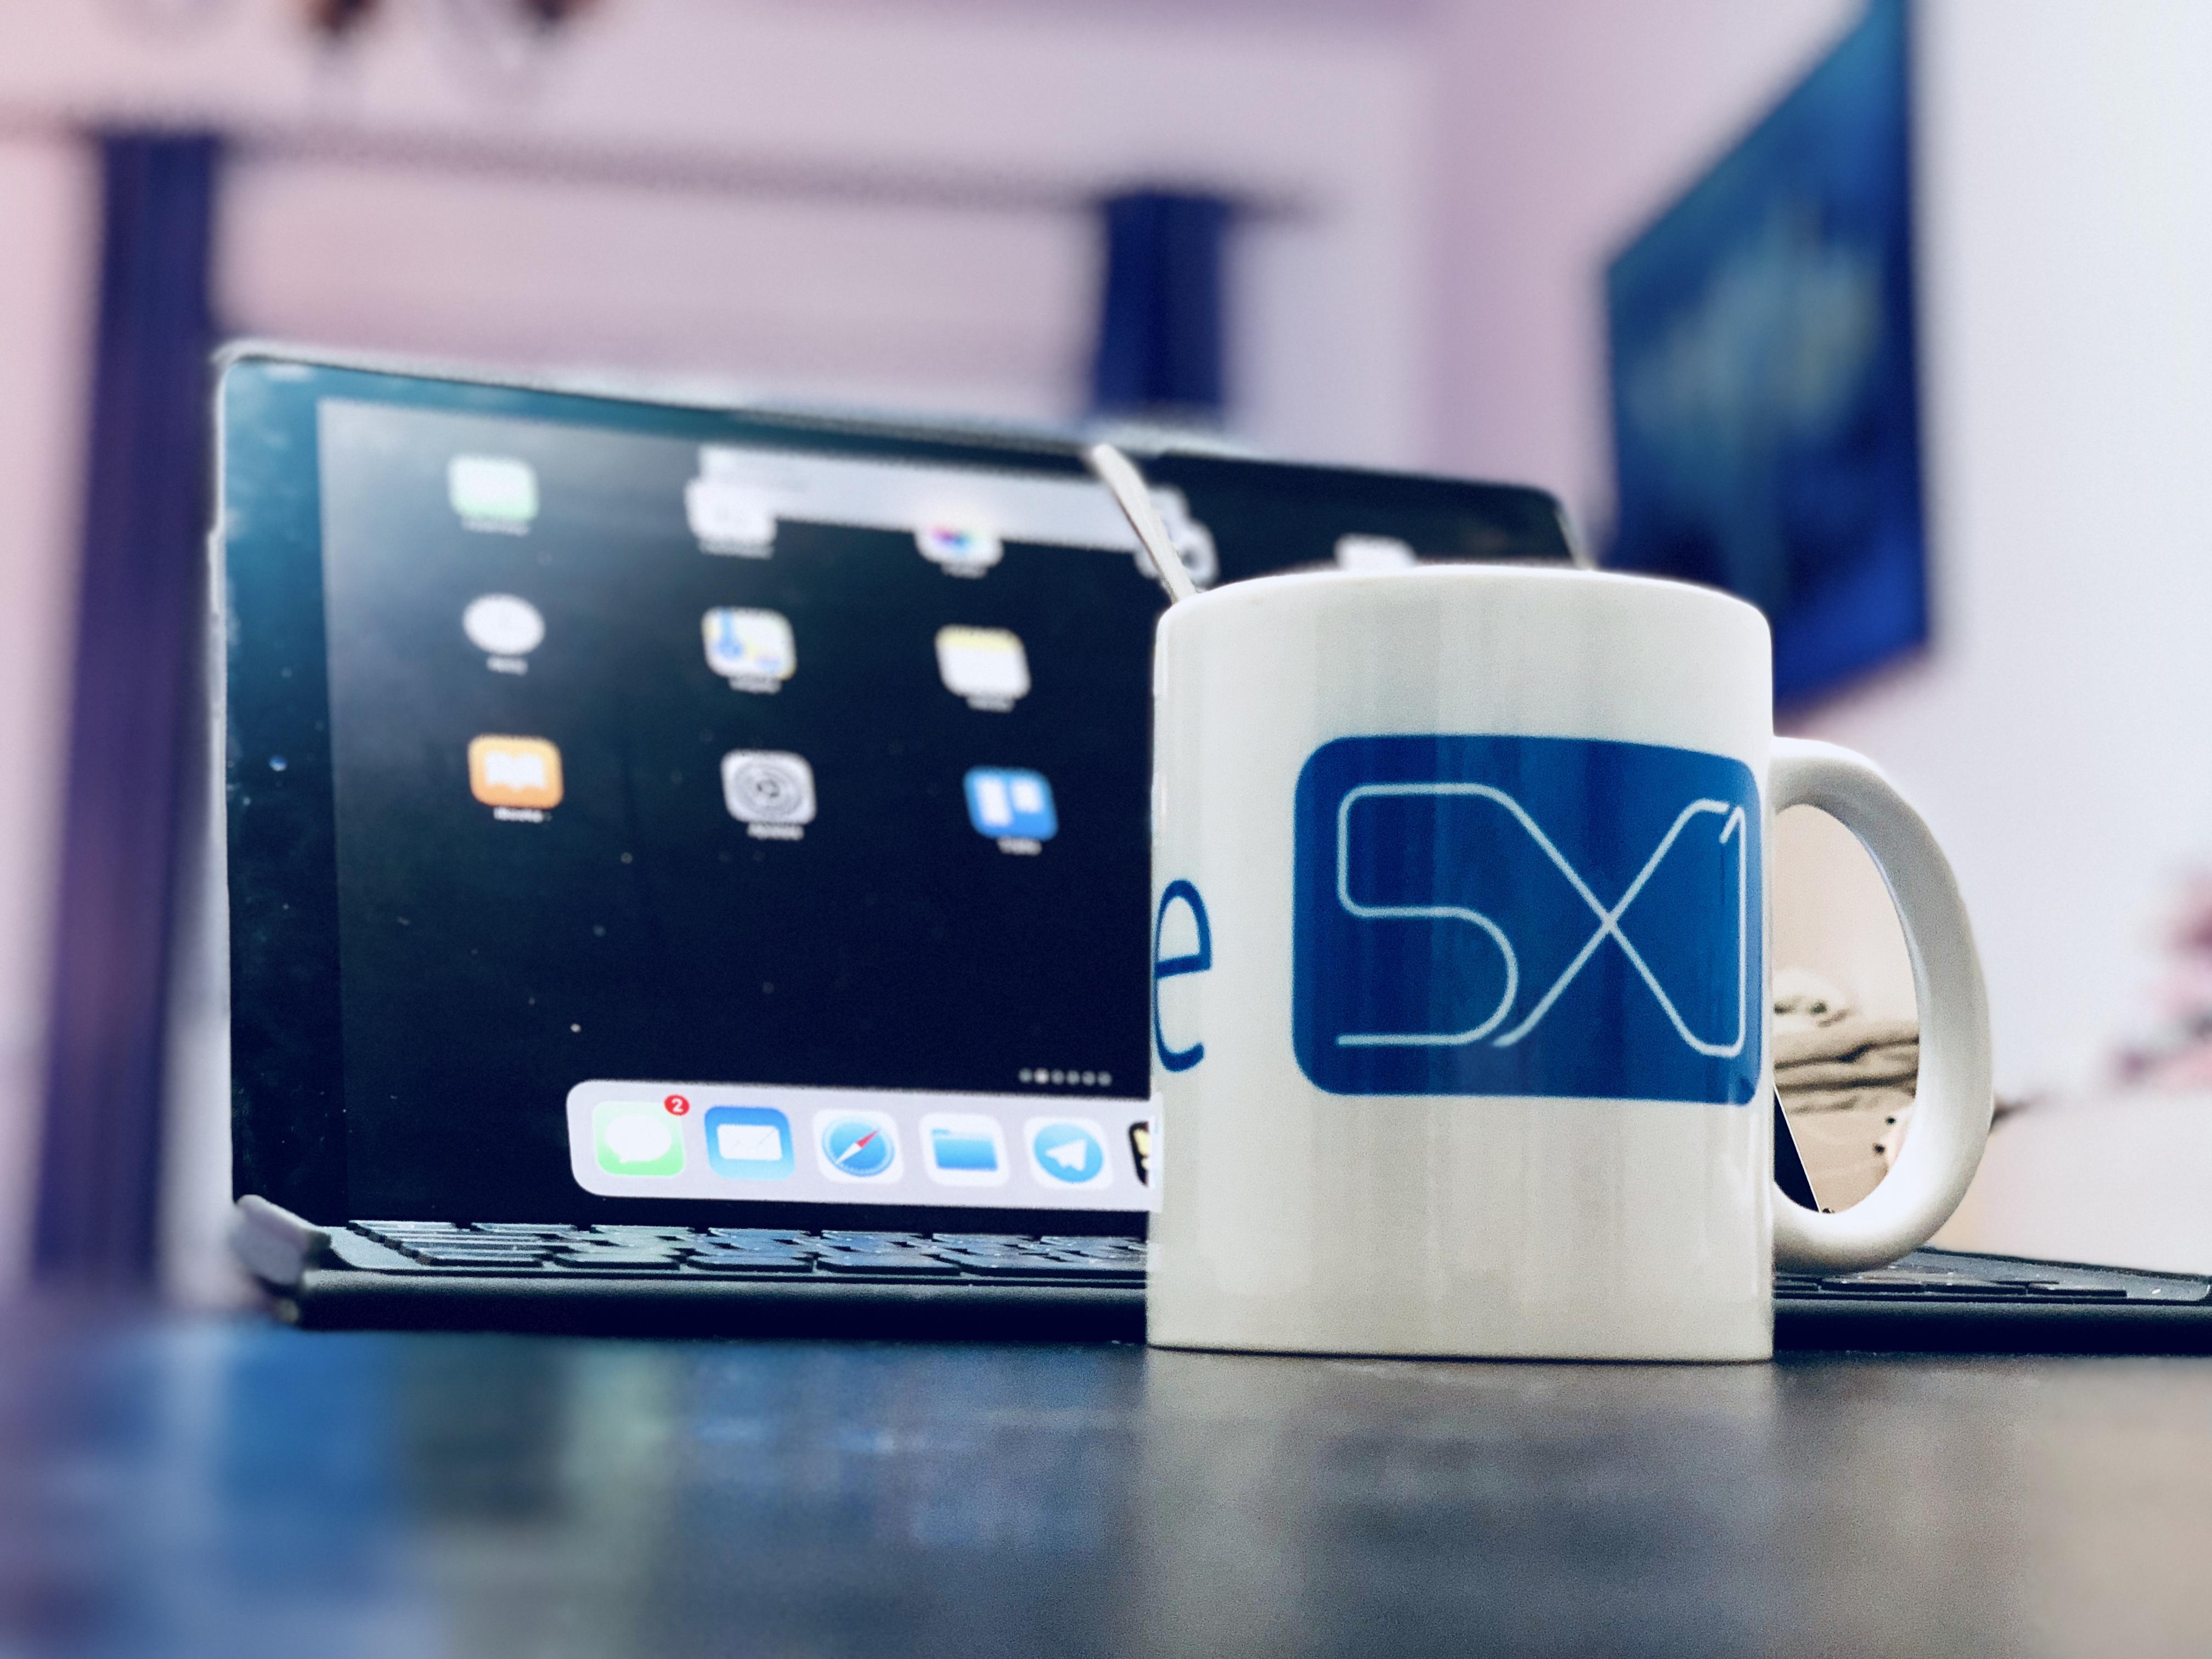 iPad Ricky Apple 5x1